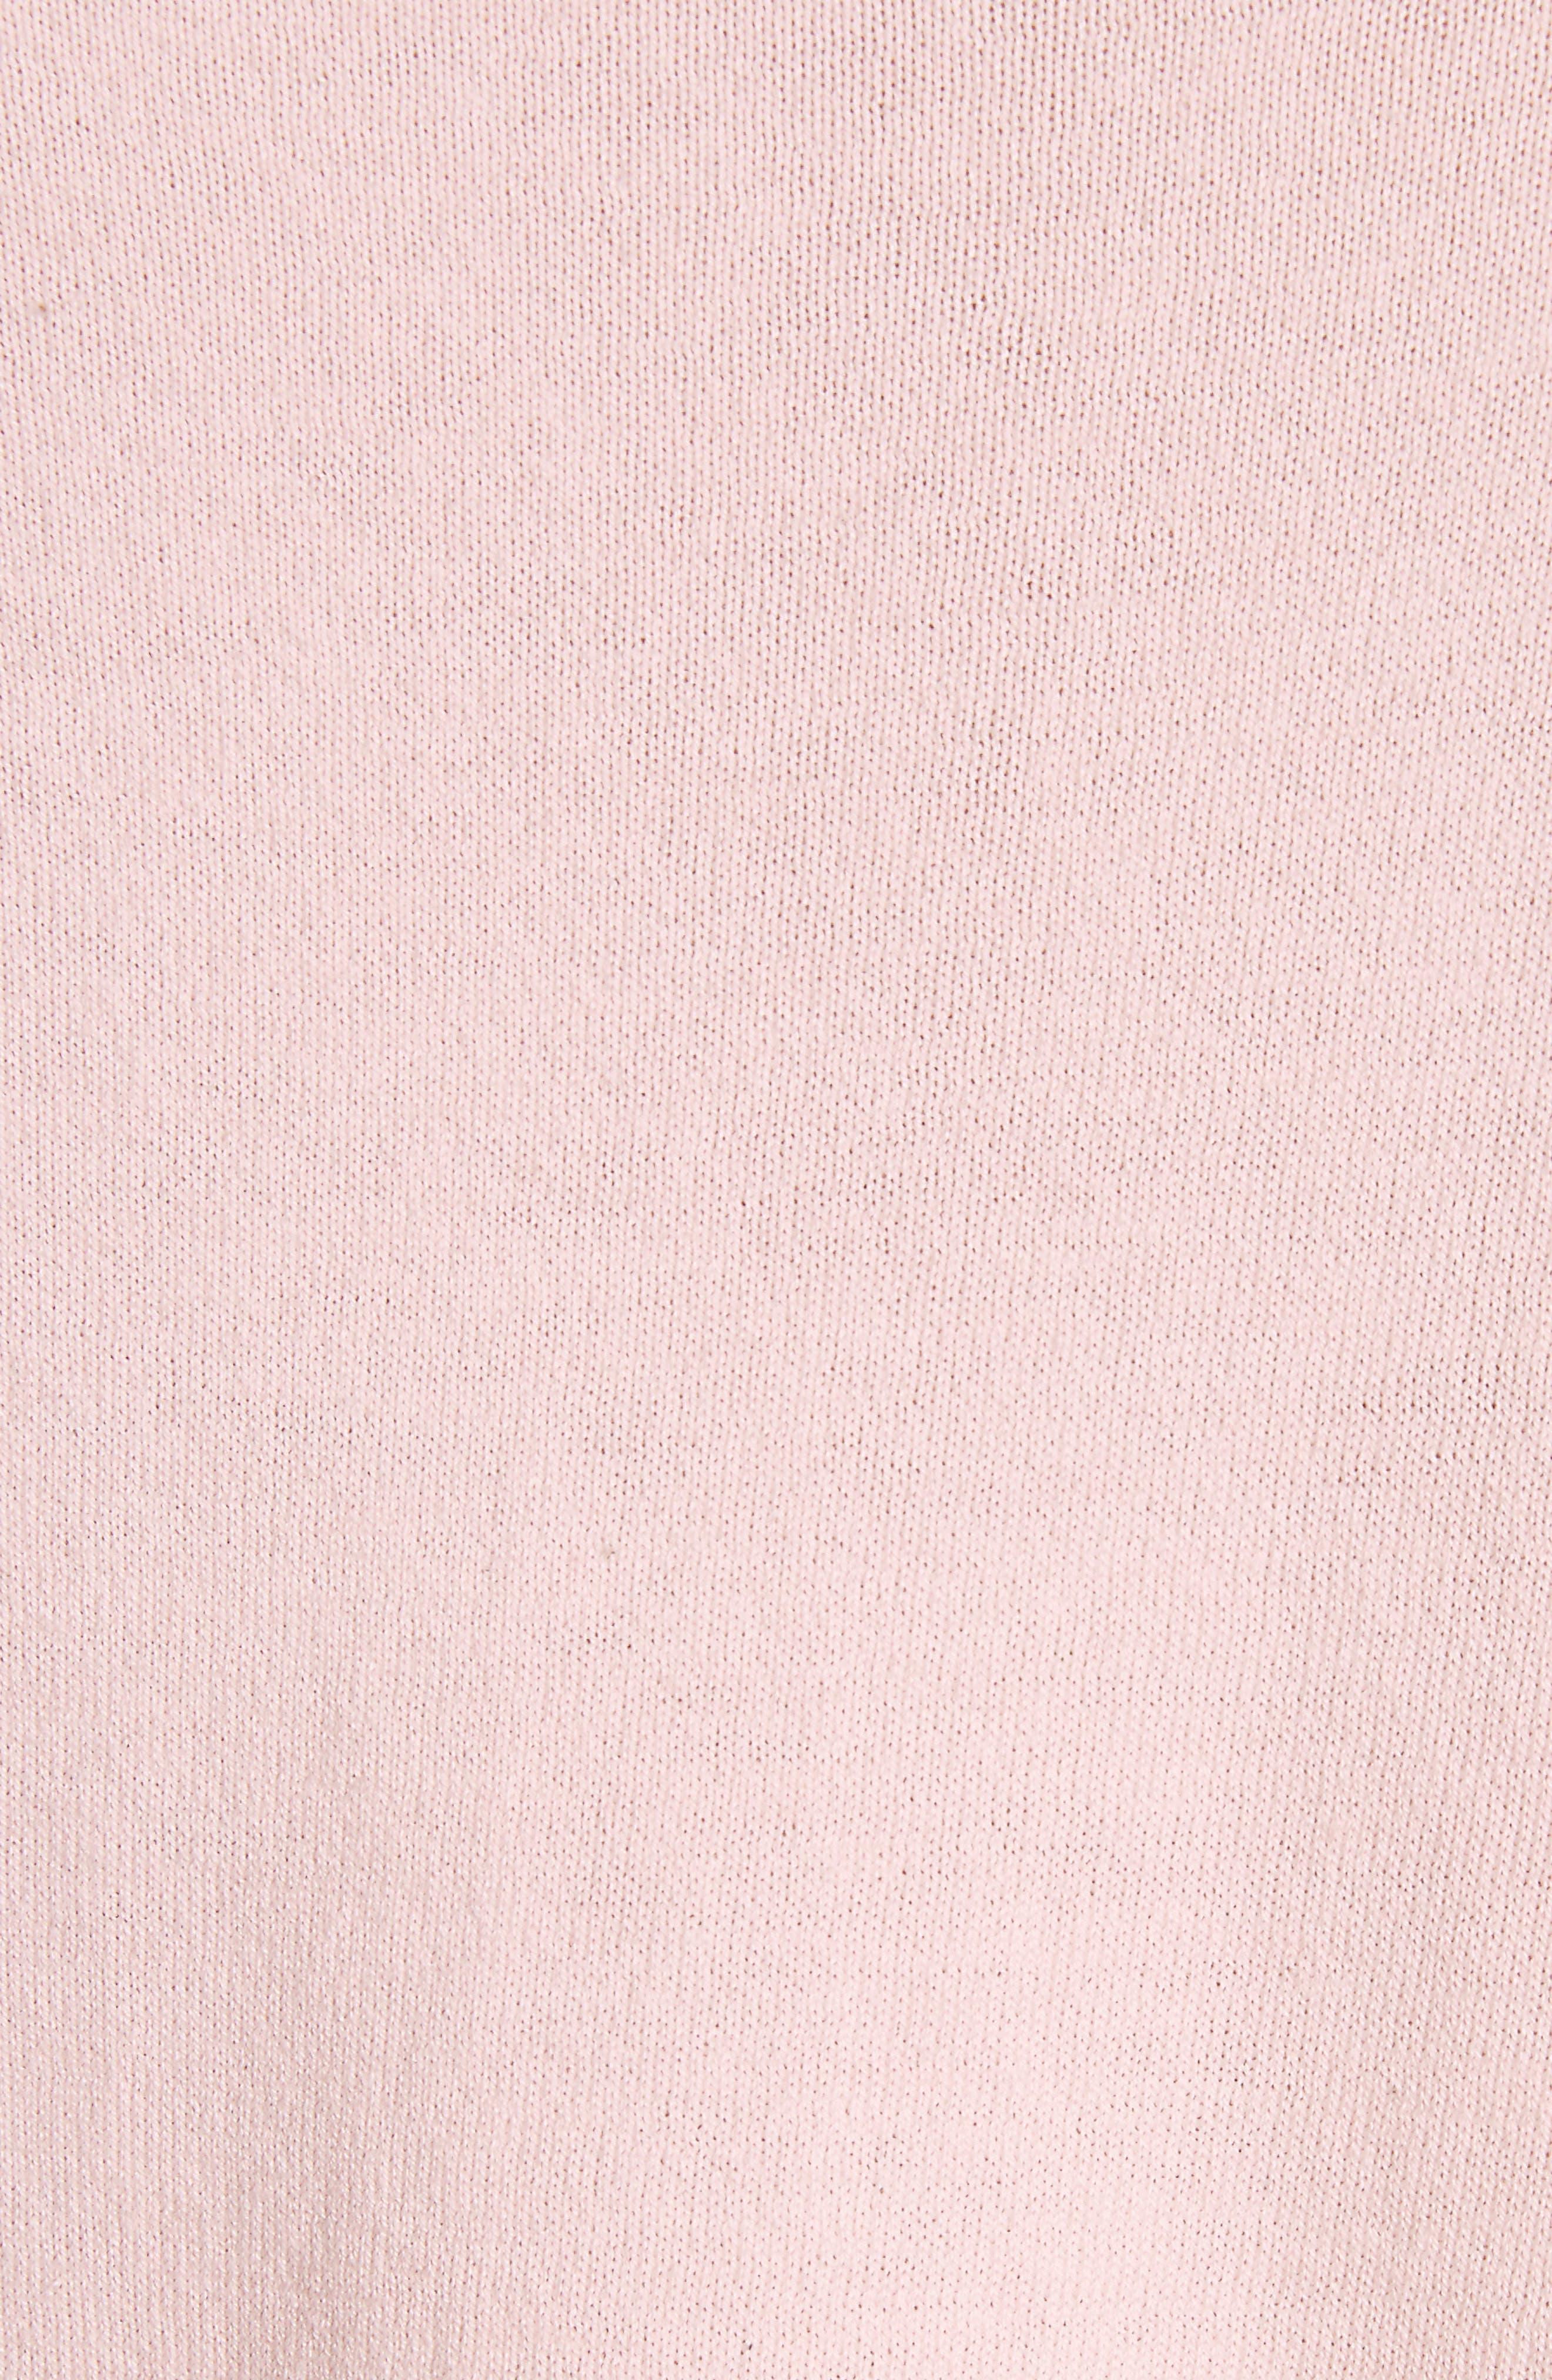 Paari Silk & Cashmere Sweater,                             Alternate thumbnail 5, color,